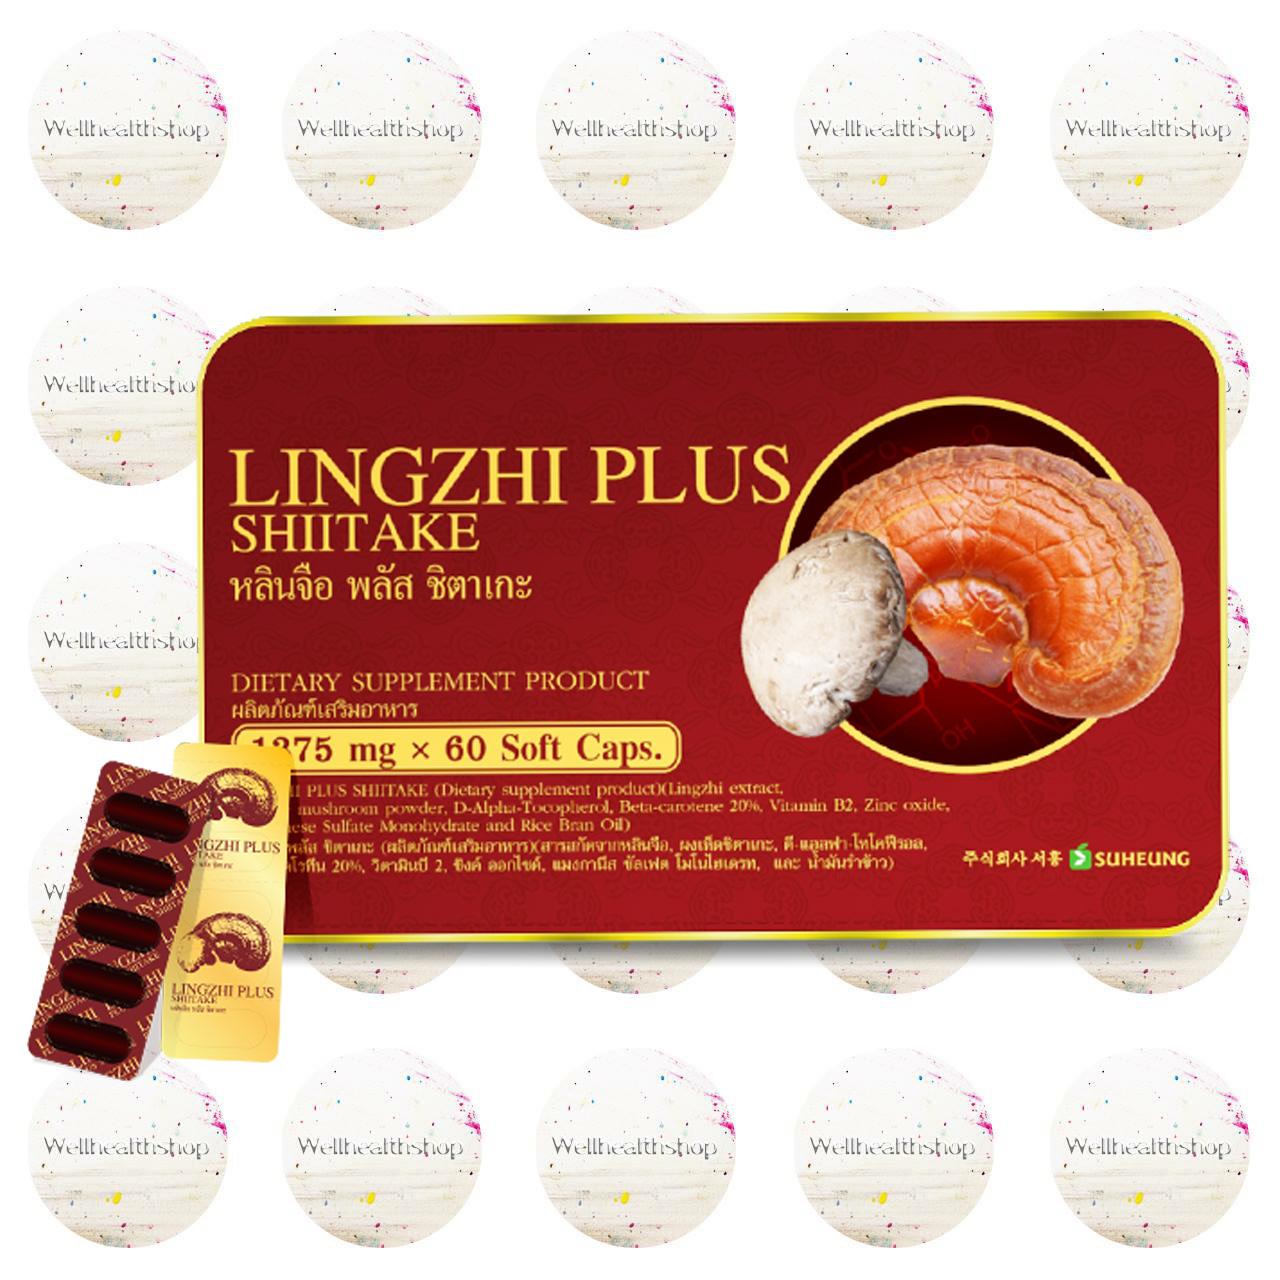 Lingzhi Plus Shiitake หลินจือ พลัส ชิตาเกะ